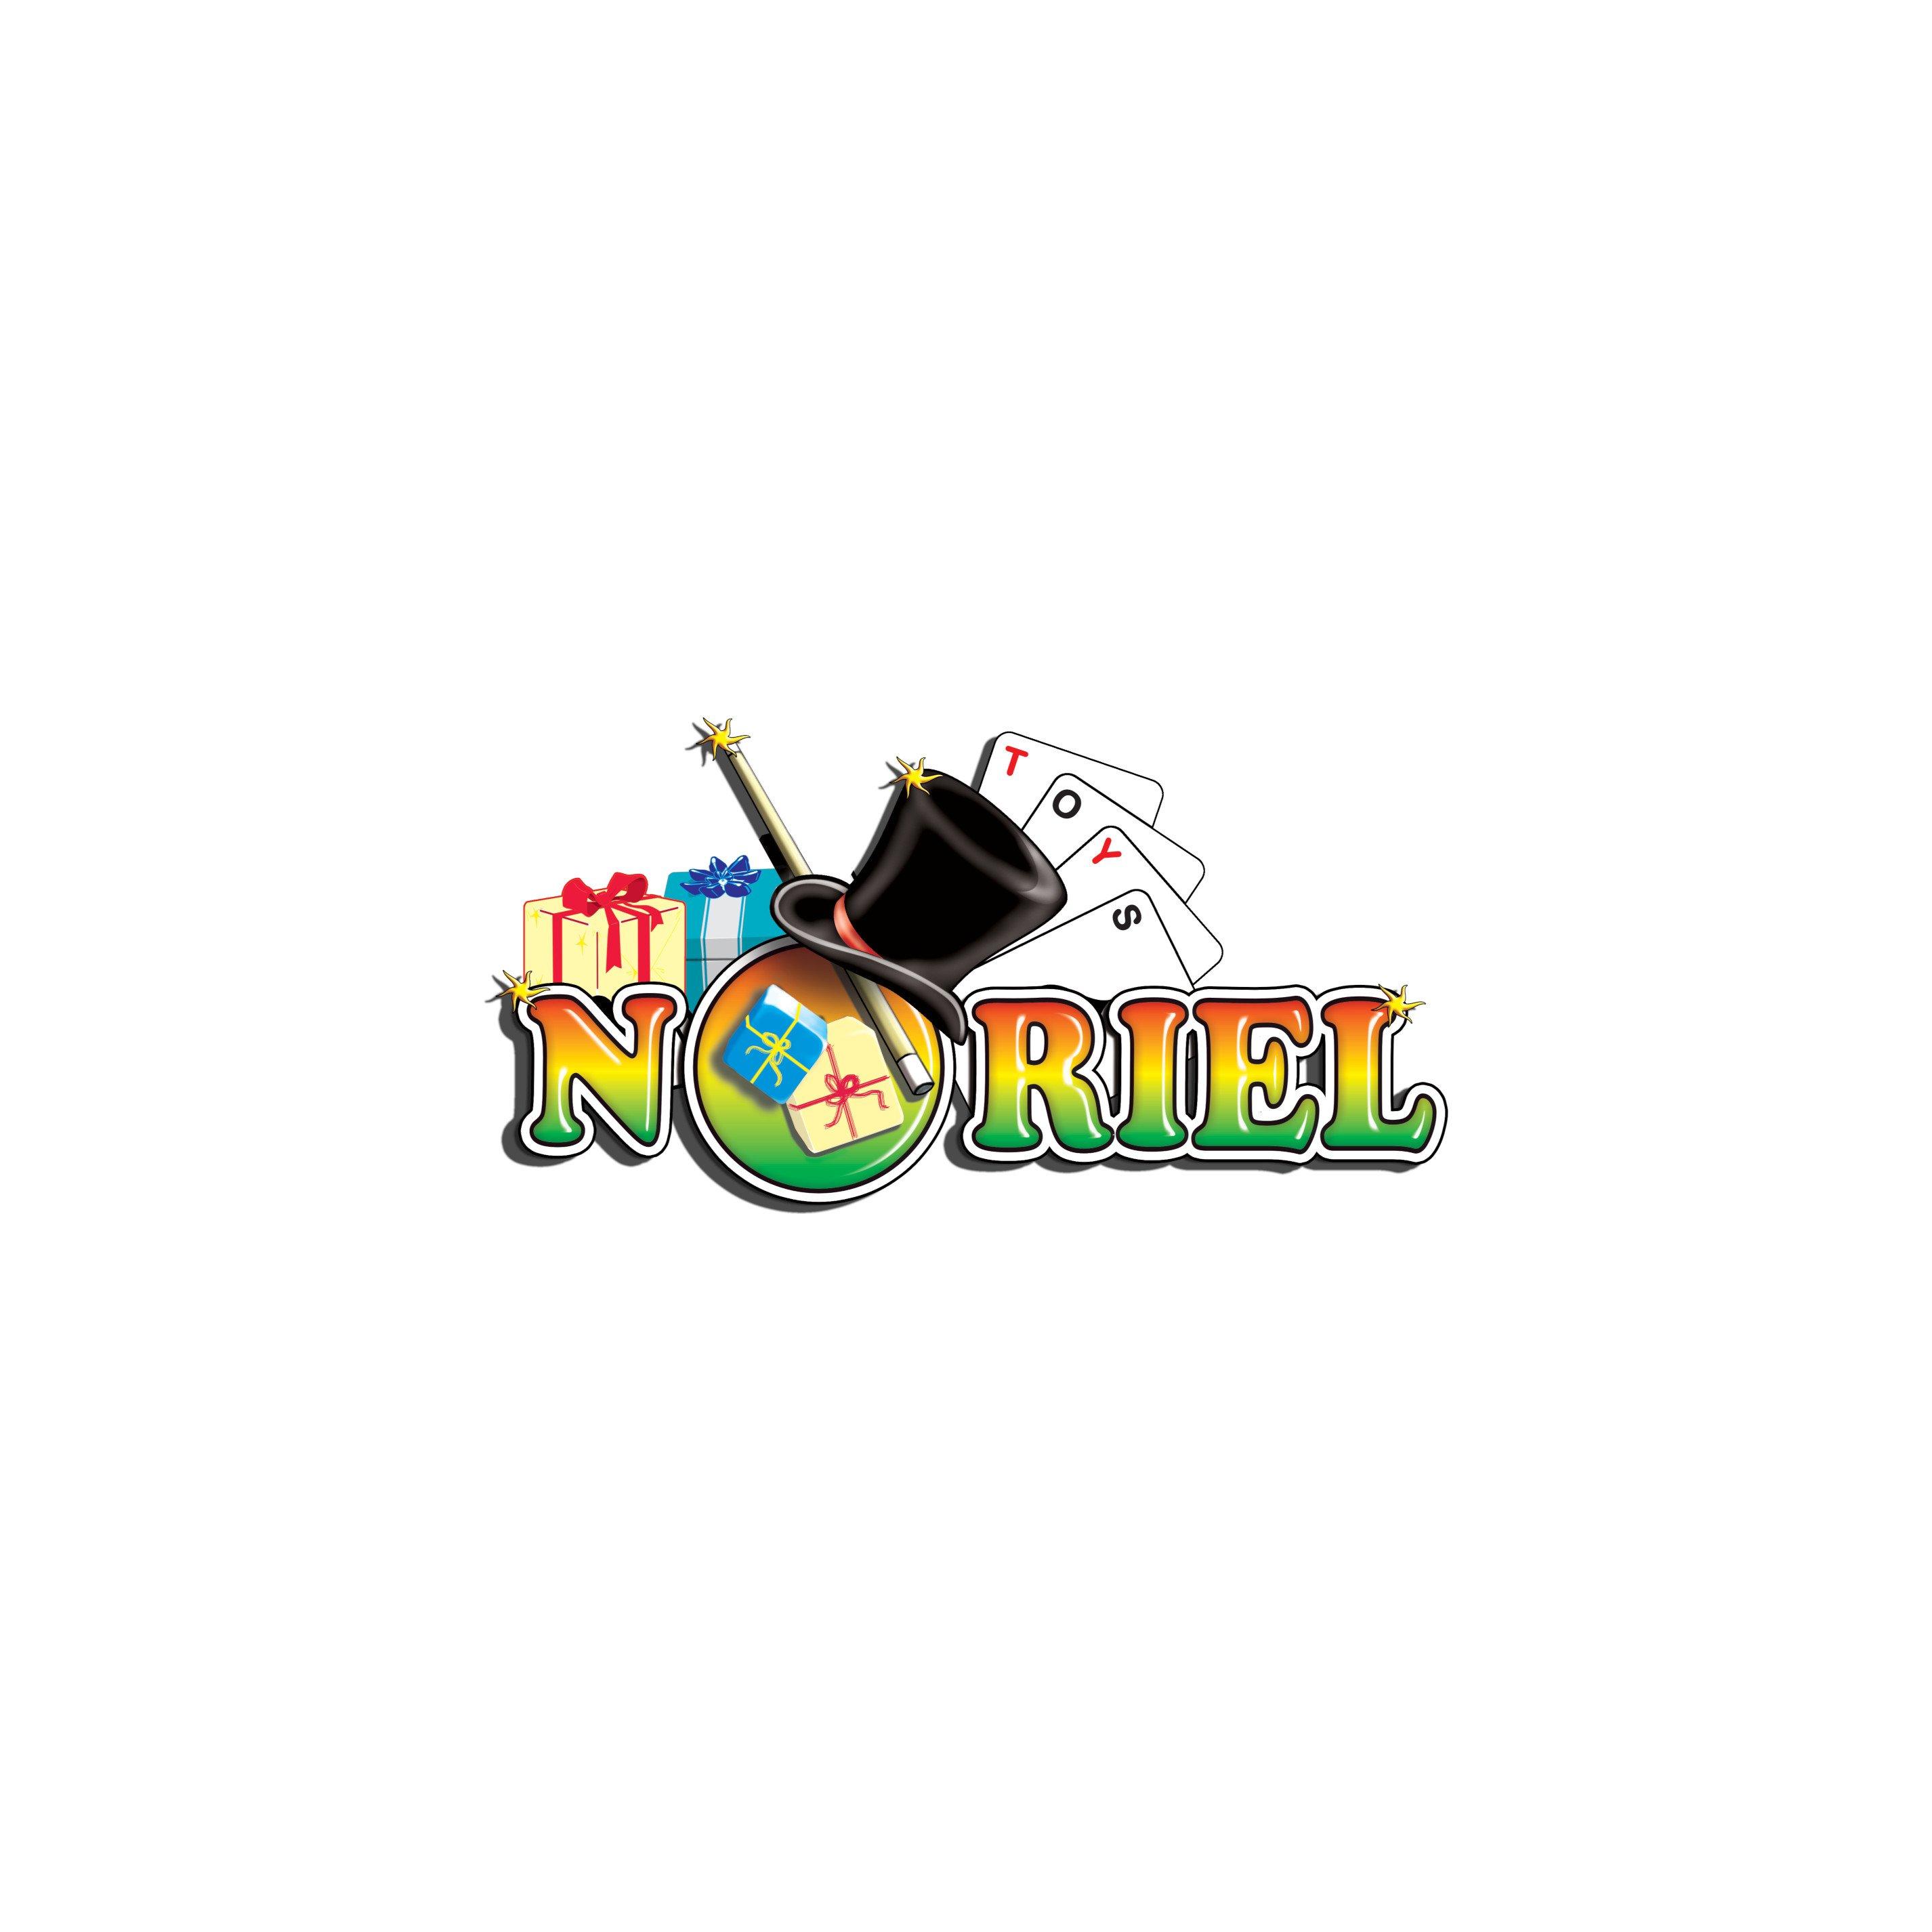 DK000579594_001w Creion cu guma de sters, Must